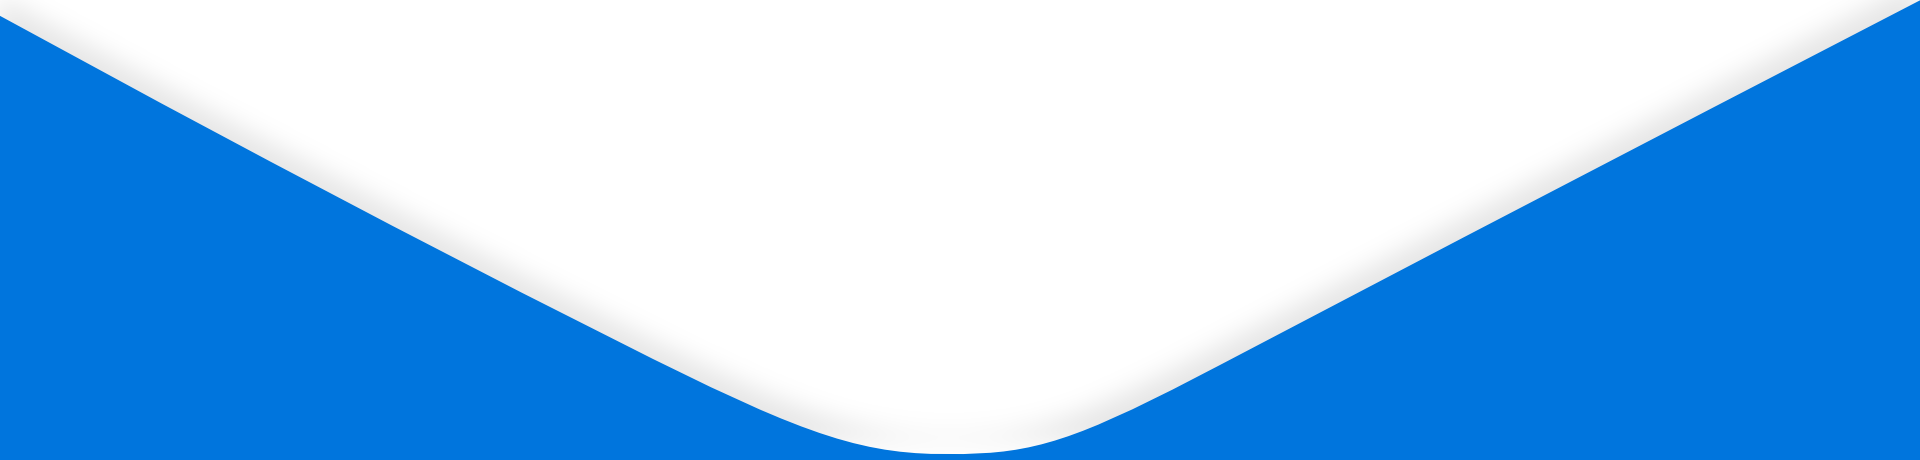 blue-curve